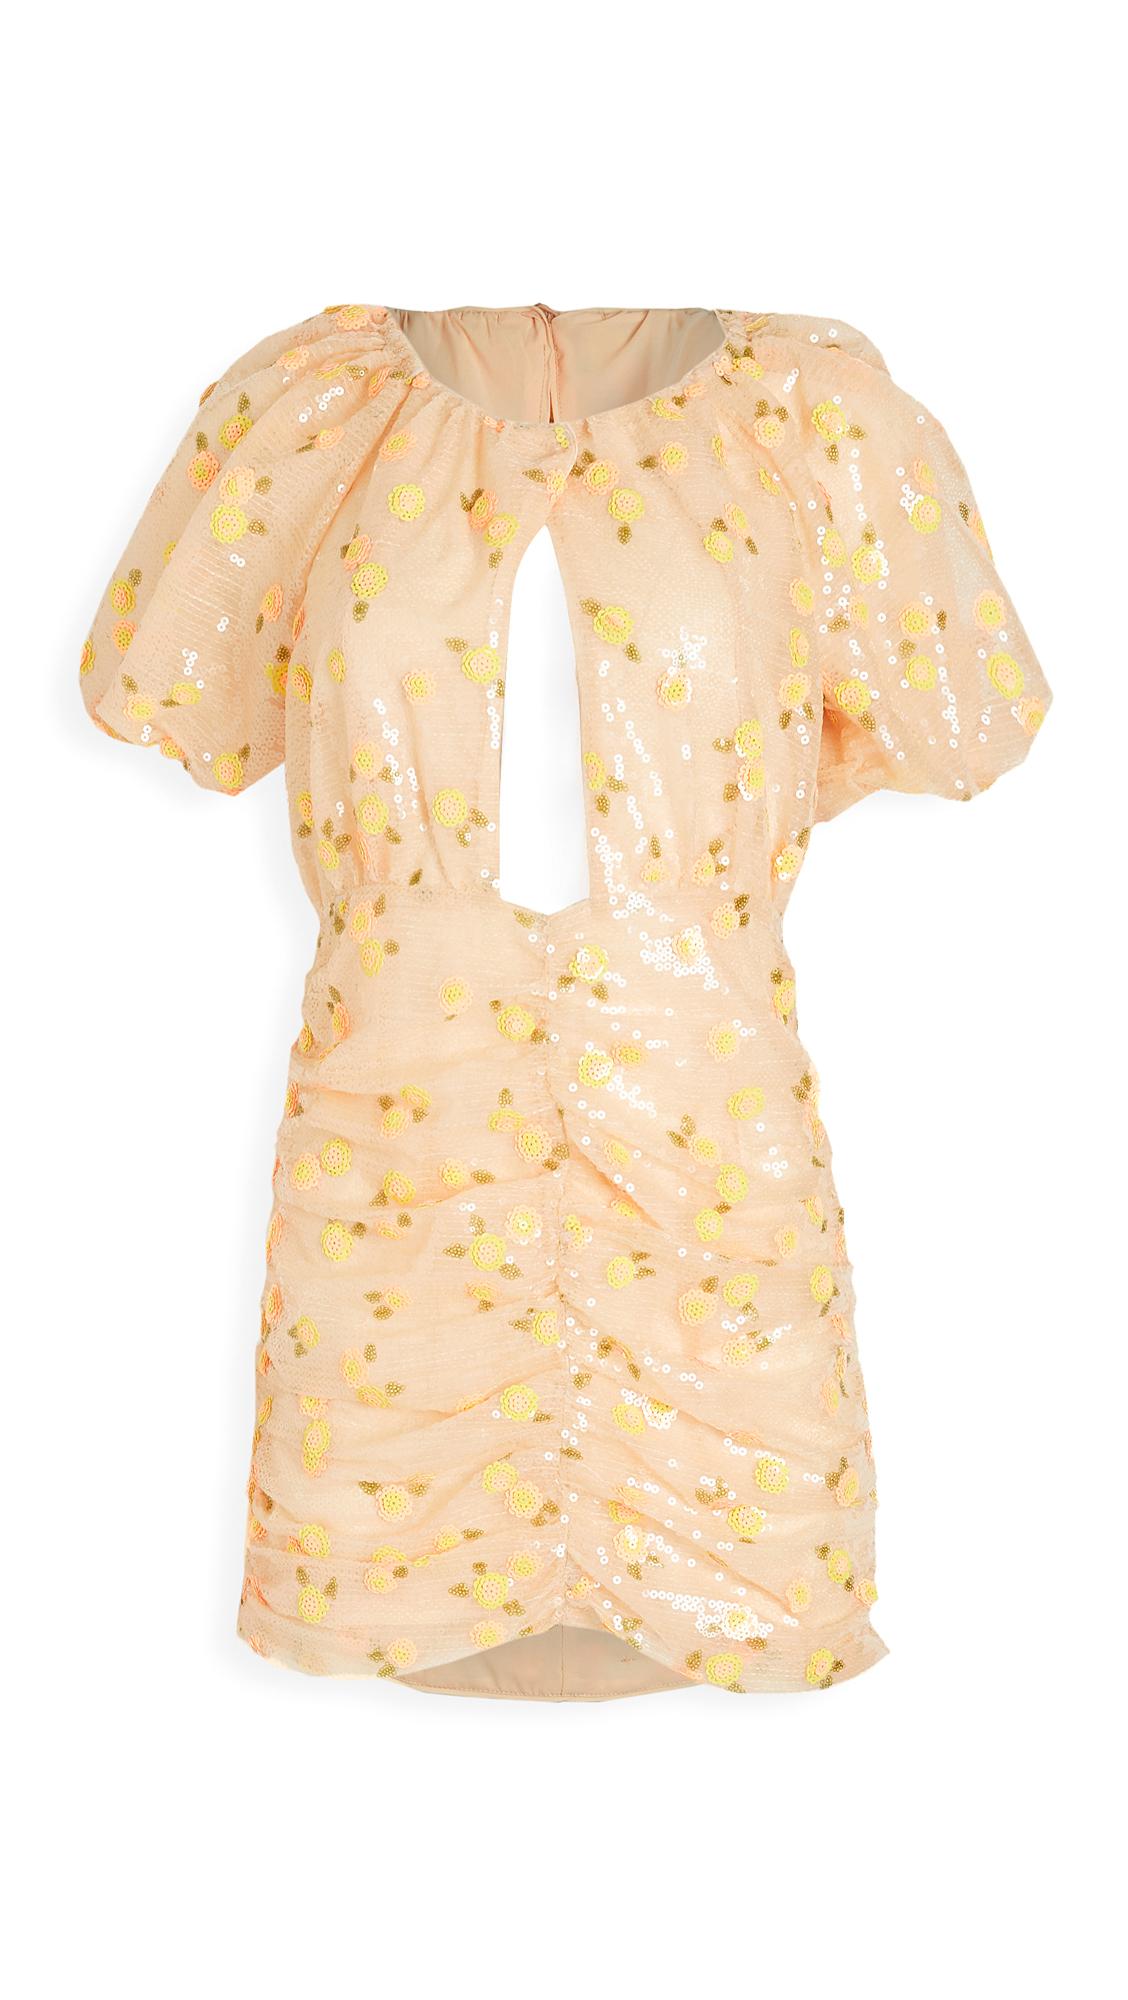 For Love & Lemons Ryder Sequin Mini Dress - 30% Off Sale